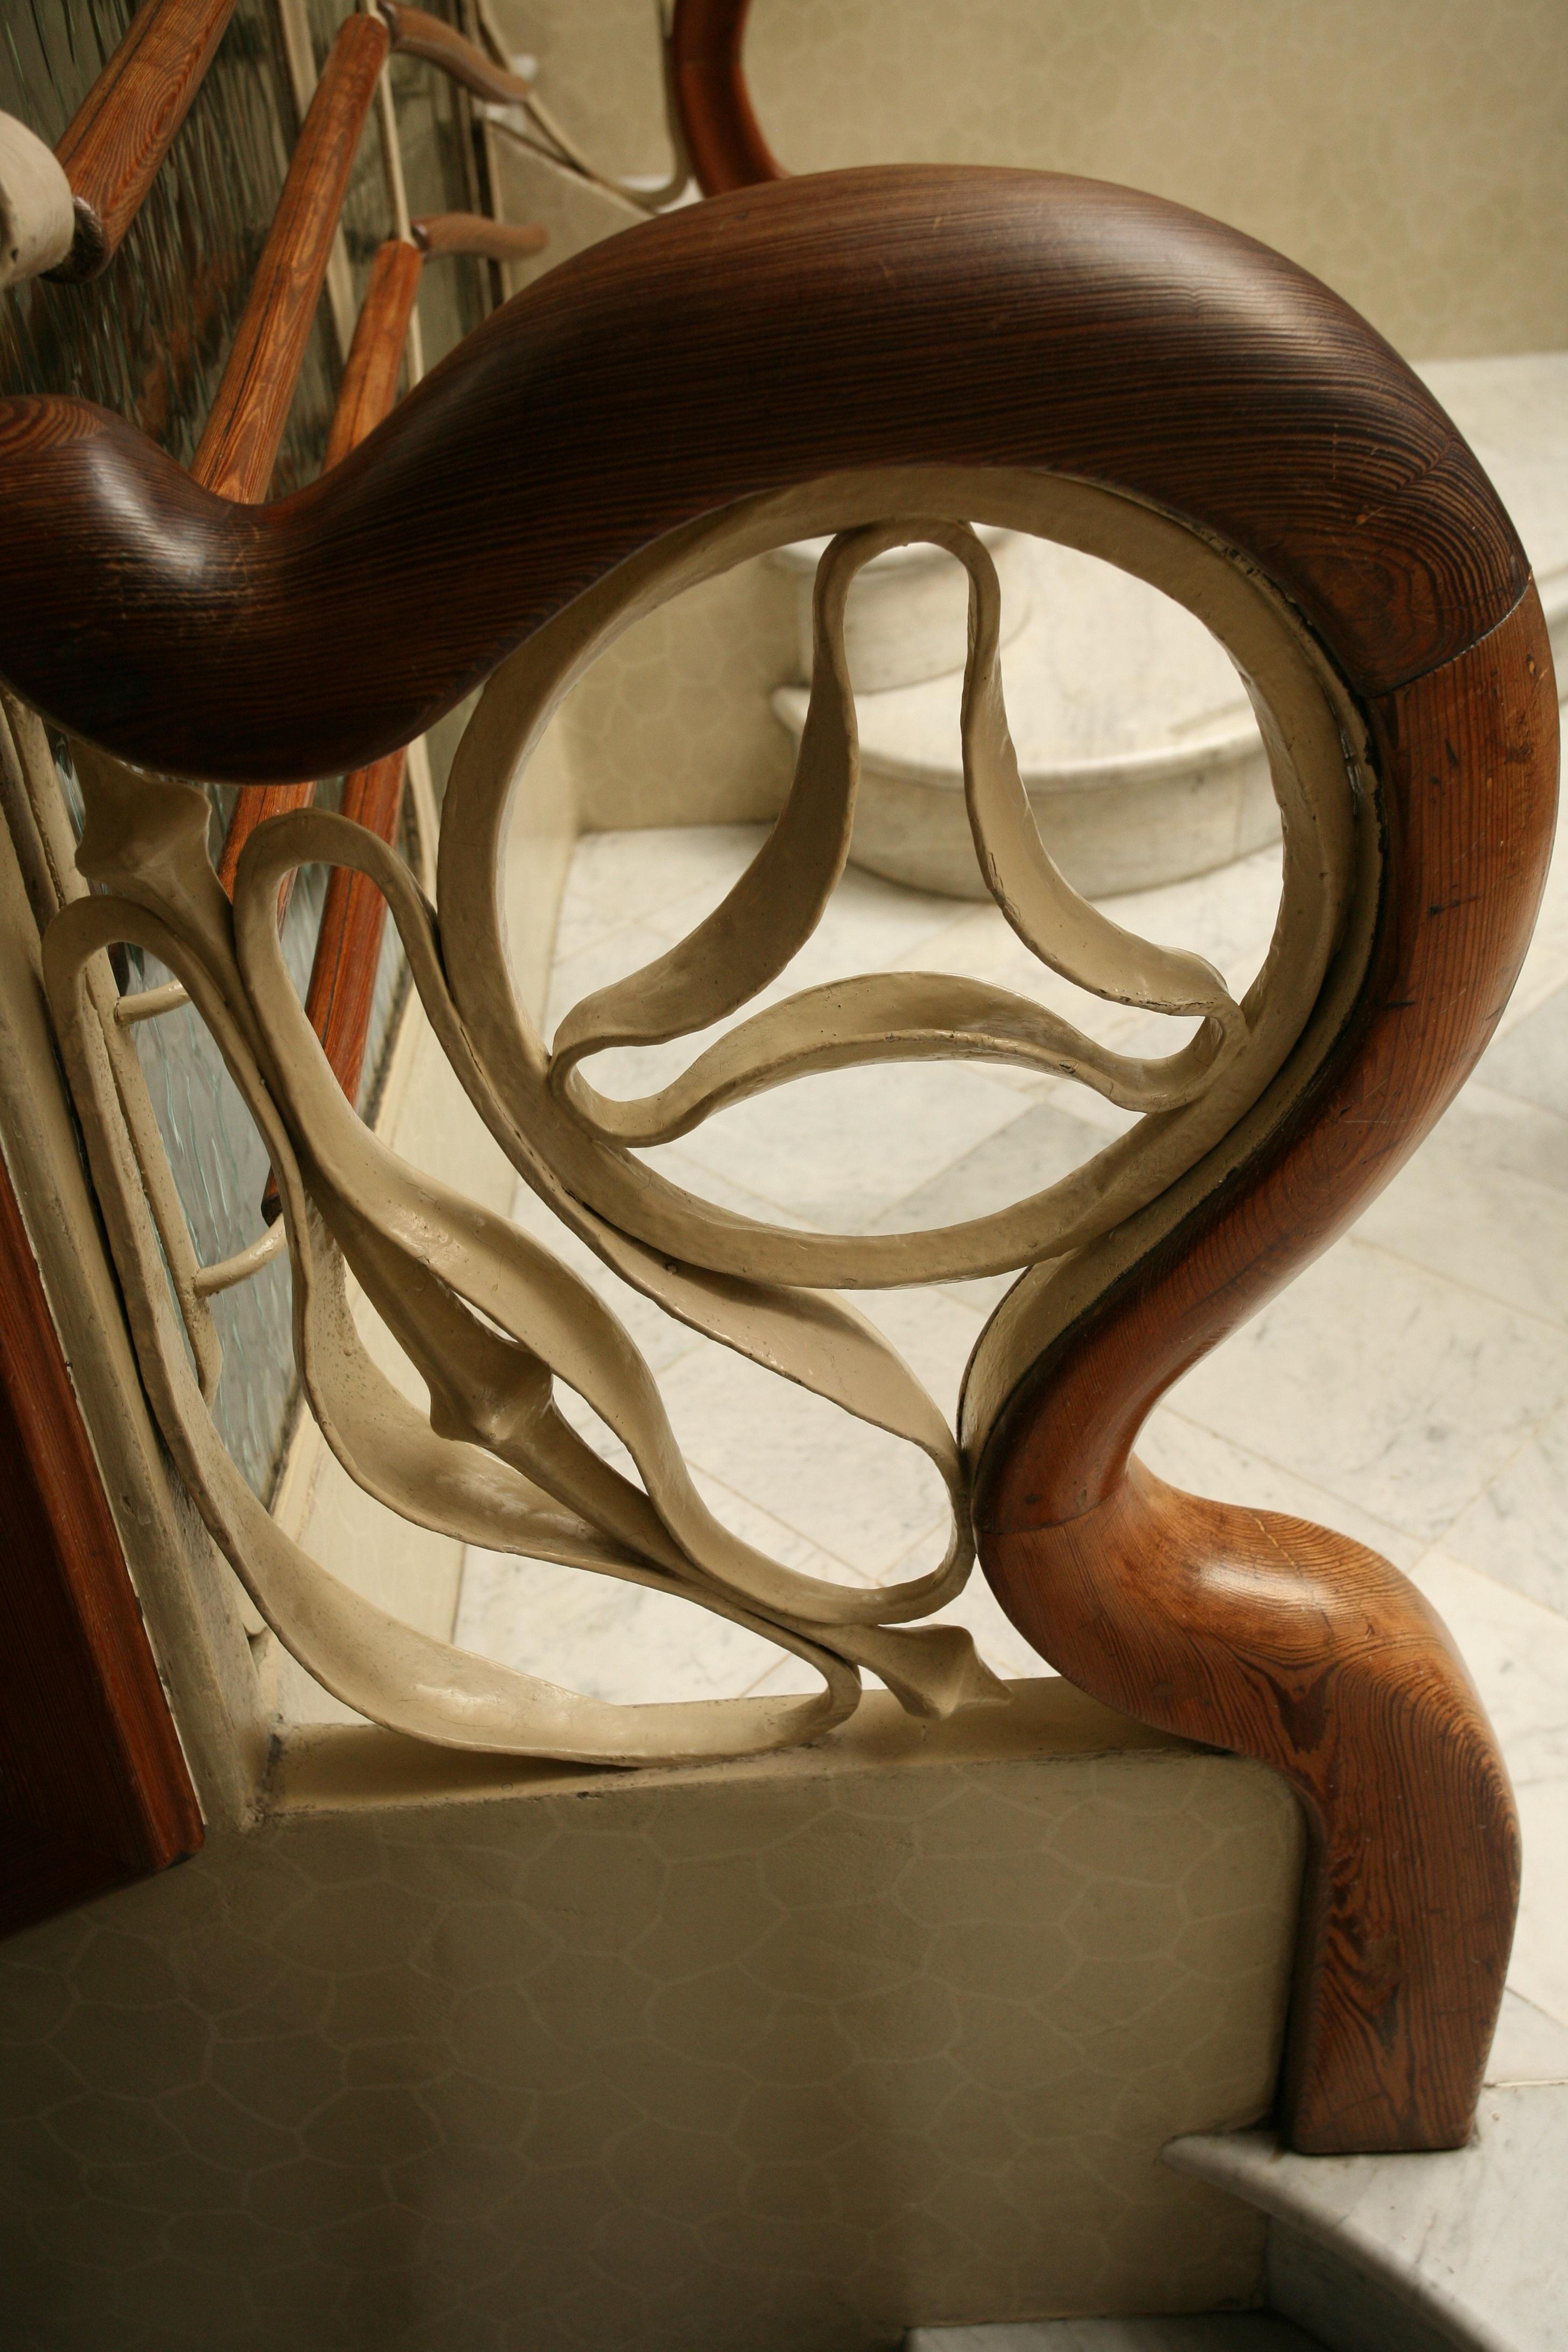 Fotos Gratis Mesa Arquitectura Madera Silla Interior  # Muebles Fundidos Artisticos